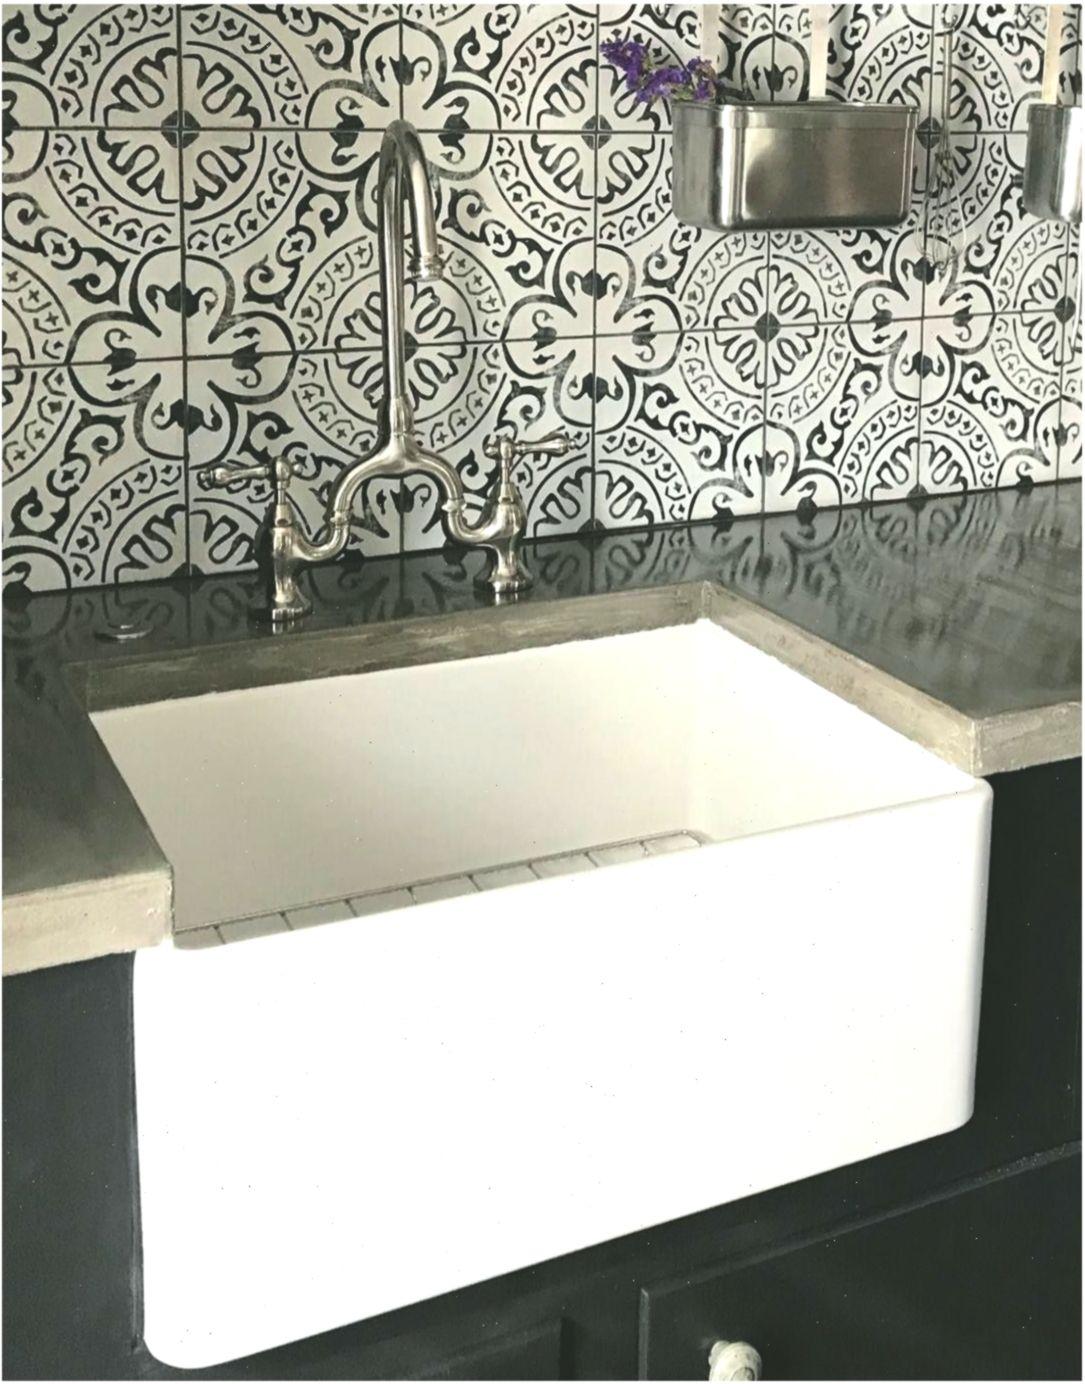 24 Inch Single Bowl Farmhouse Sink With Chrome Drain And Grid Farmhouse Sink Sink Modern Shower